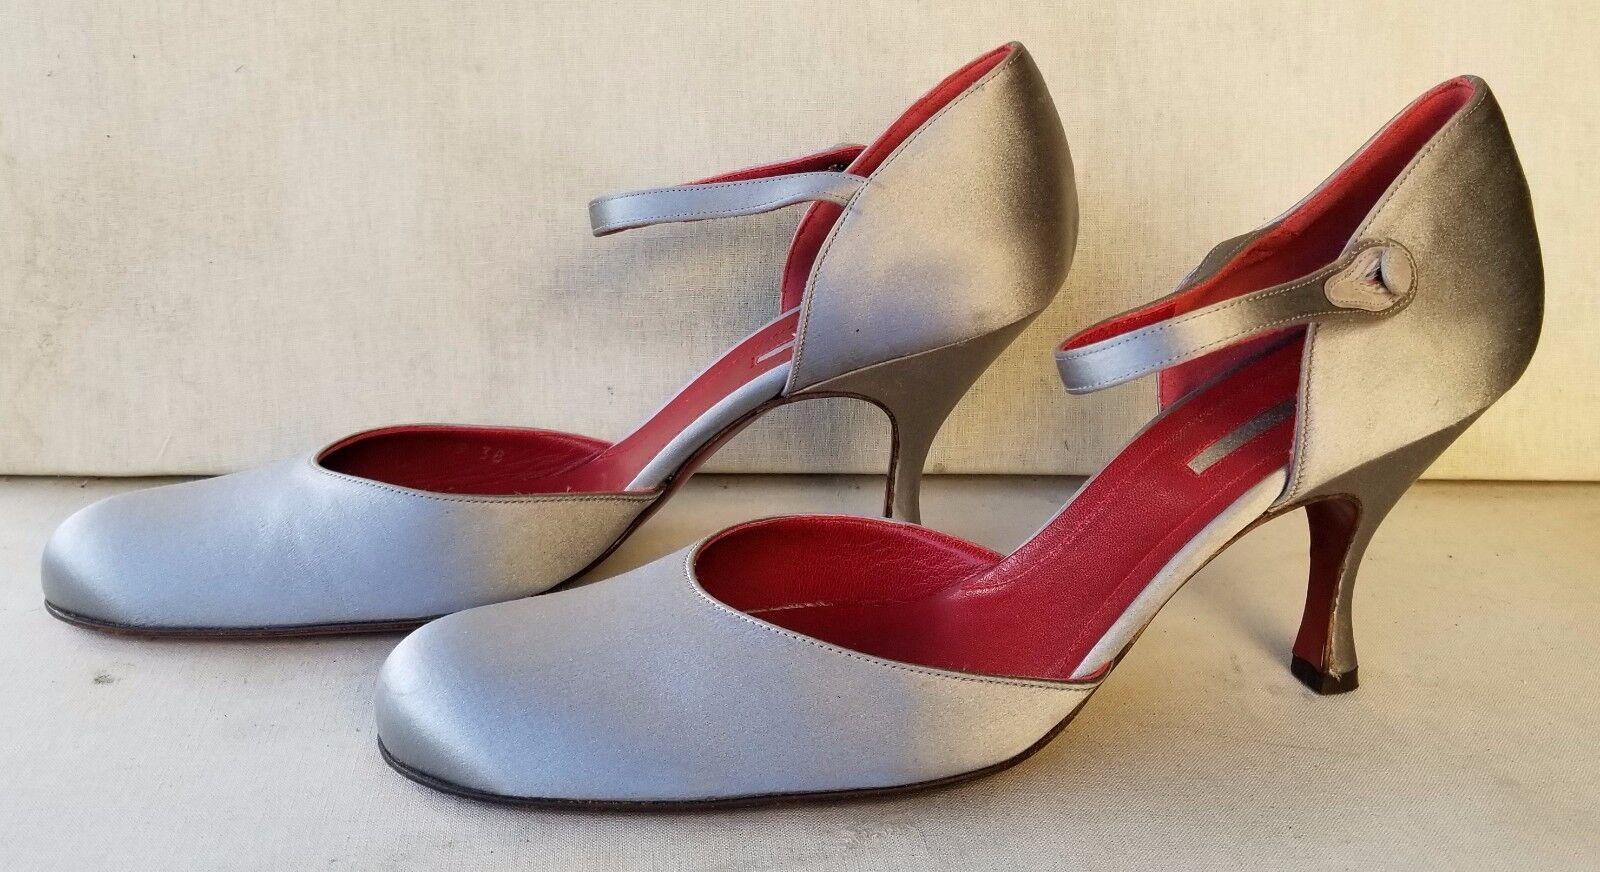 NWOB GIORGIO ARMANI Grigio Silk Satin Ankle Strap Medium Heels SZ 38